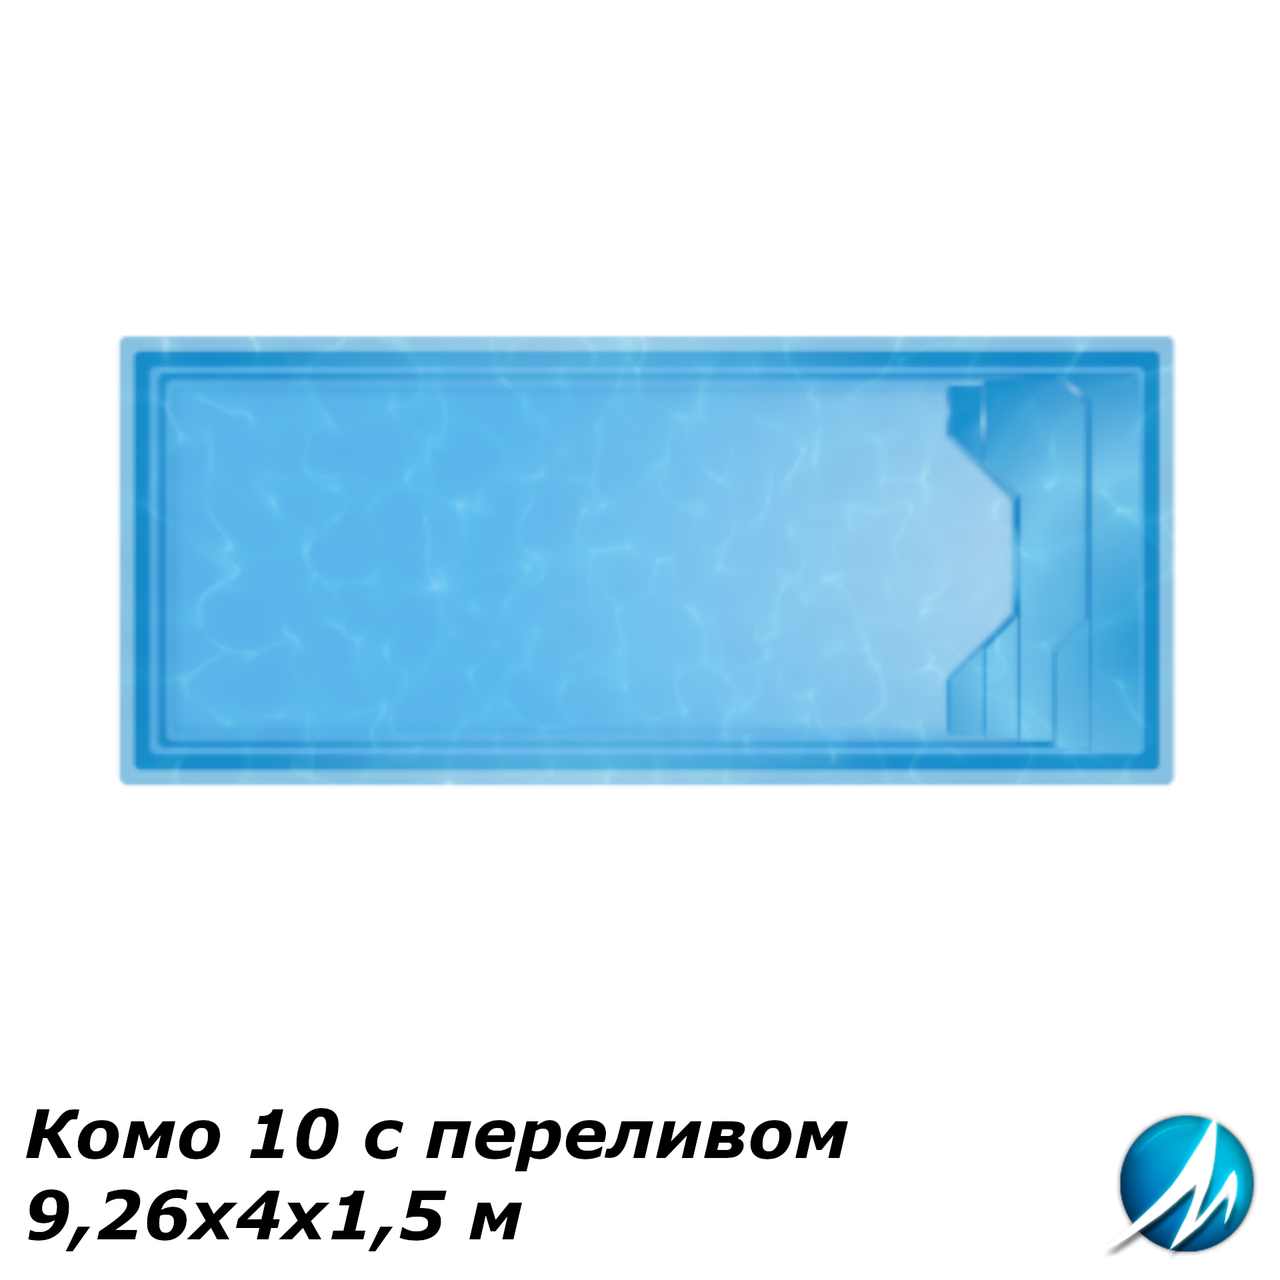 "Композитний басейн ""Комо 10"" 9,26х4х1,5 м, з переливом"